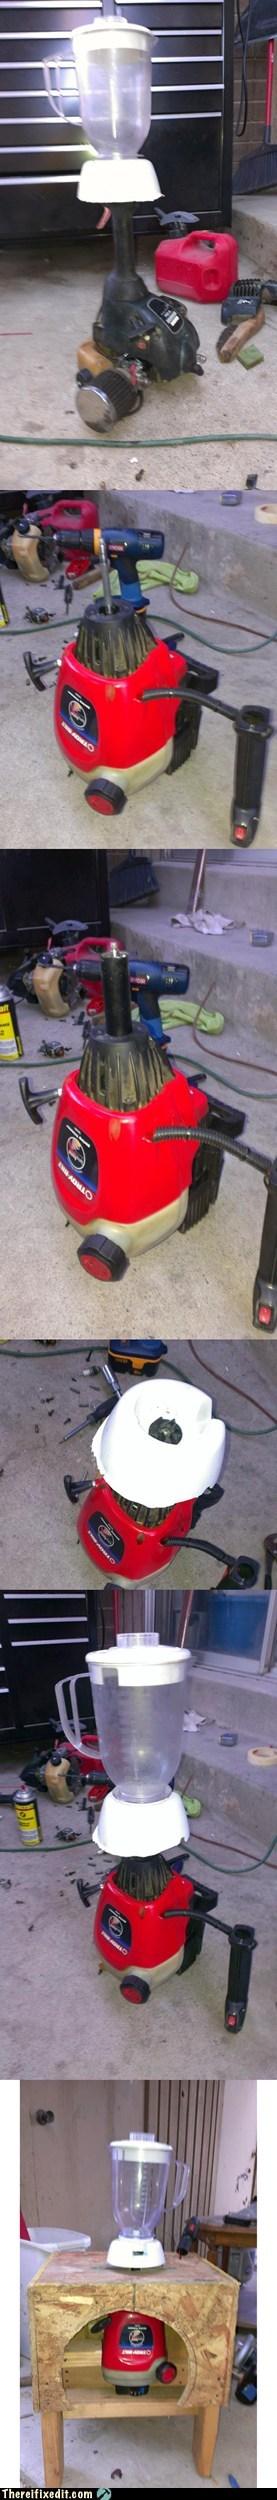 blender drill gas can gas tank - 6404179712